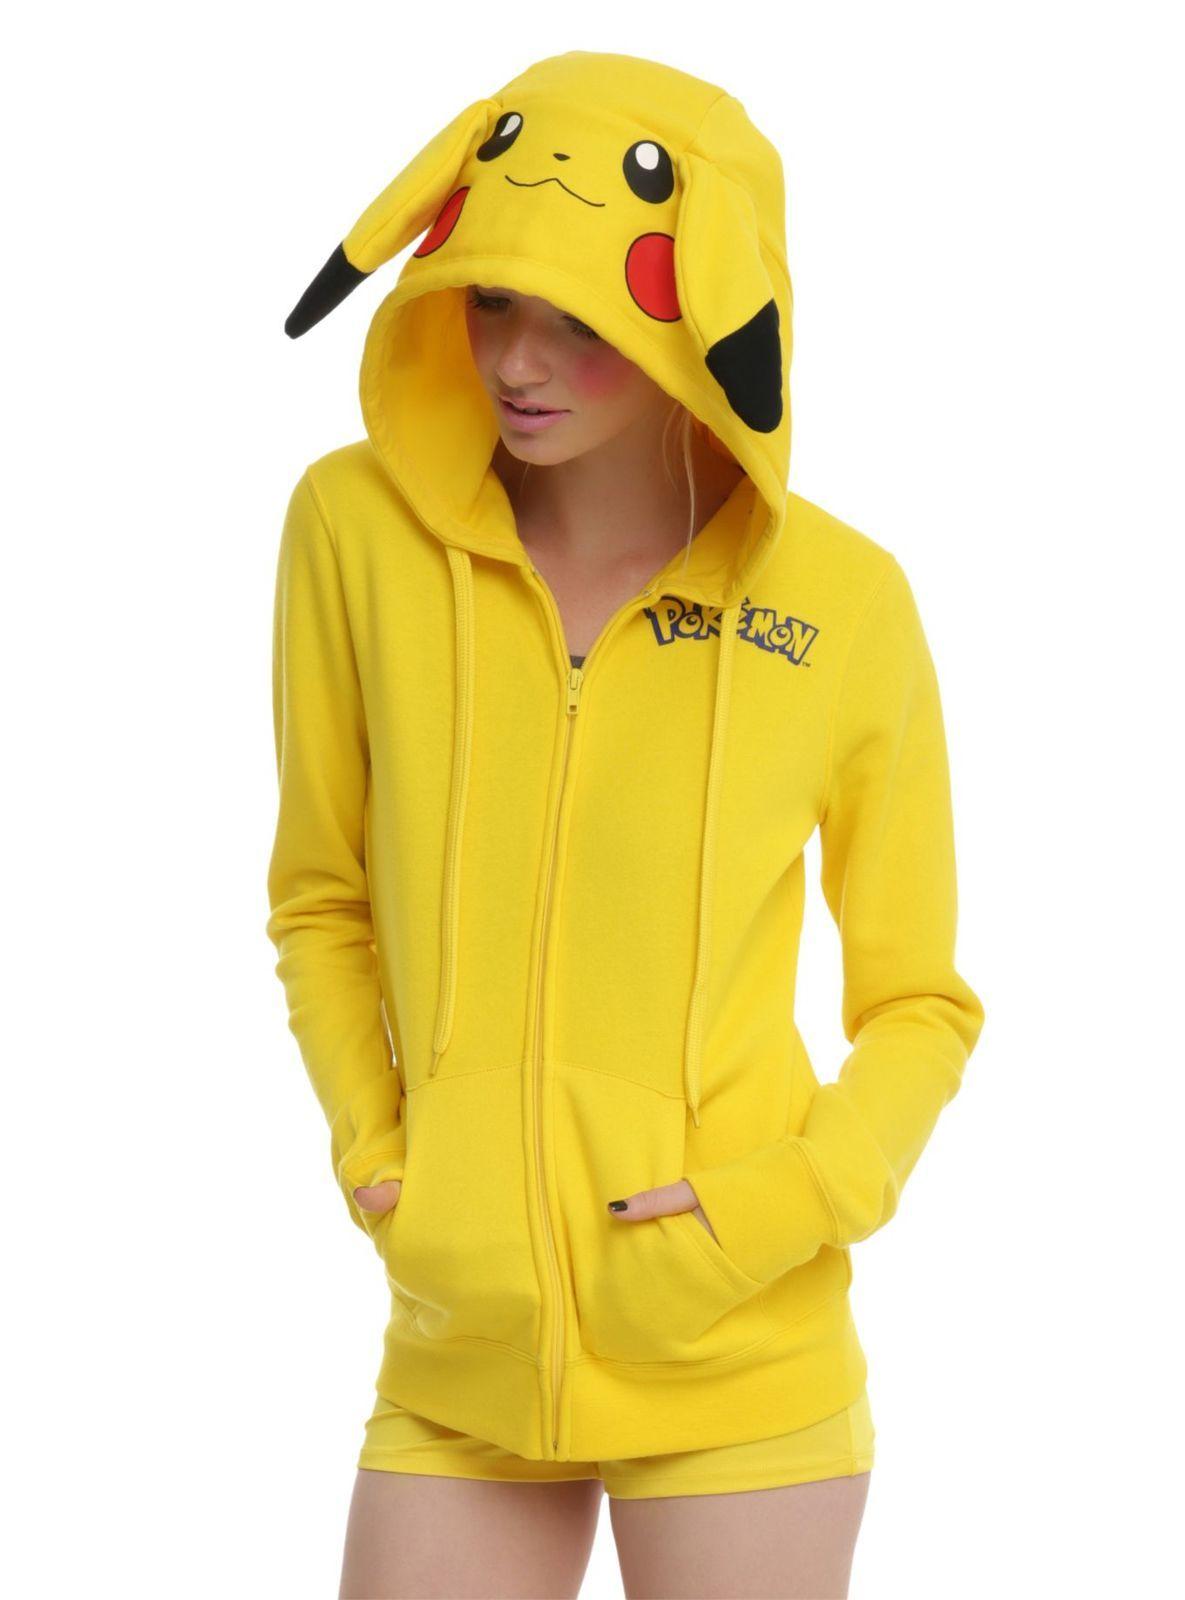 f02009622 Pokemon Girls and Boys' Pikachu Detective Costume Hoodie - Sweatshirts,  Hoodies